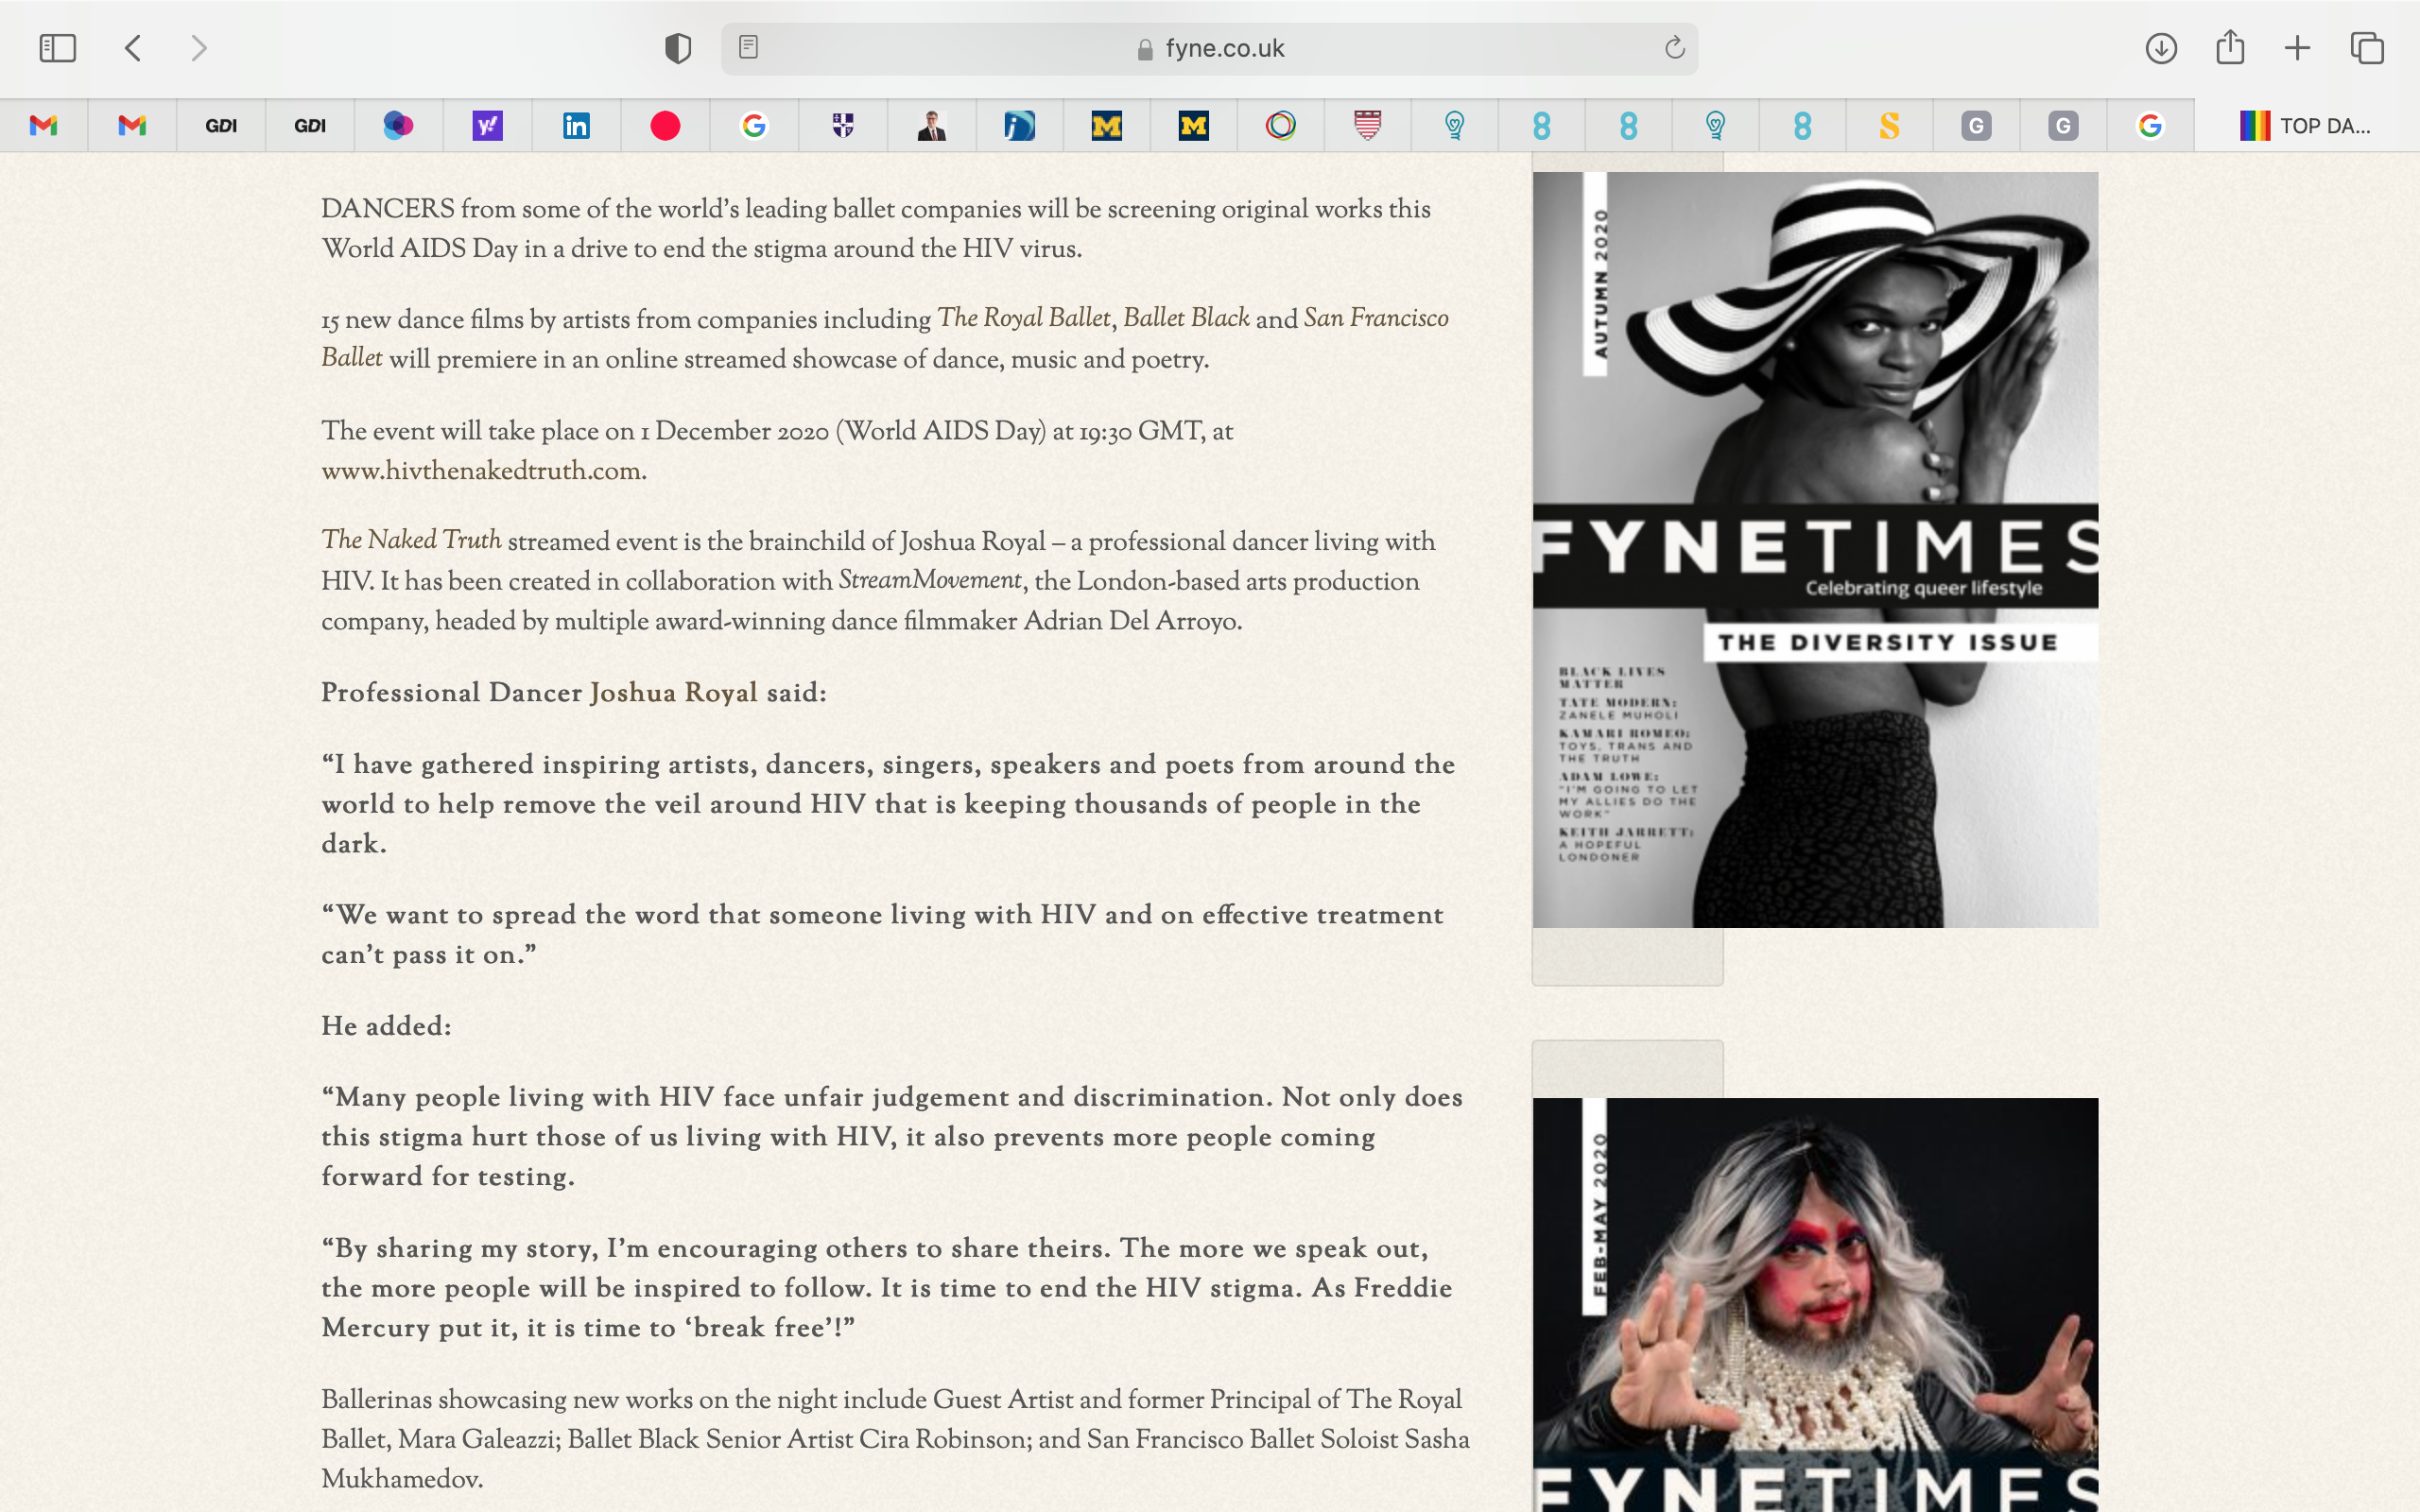 Fyne 2 Screenshot 2021-05-02 at 19.37.29